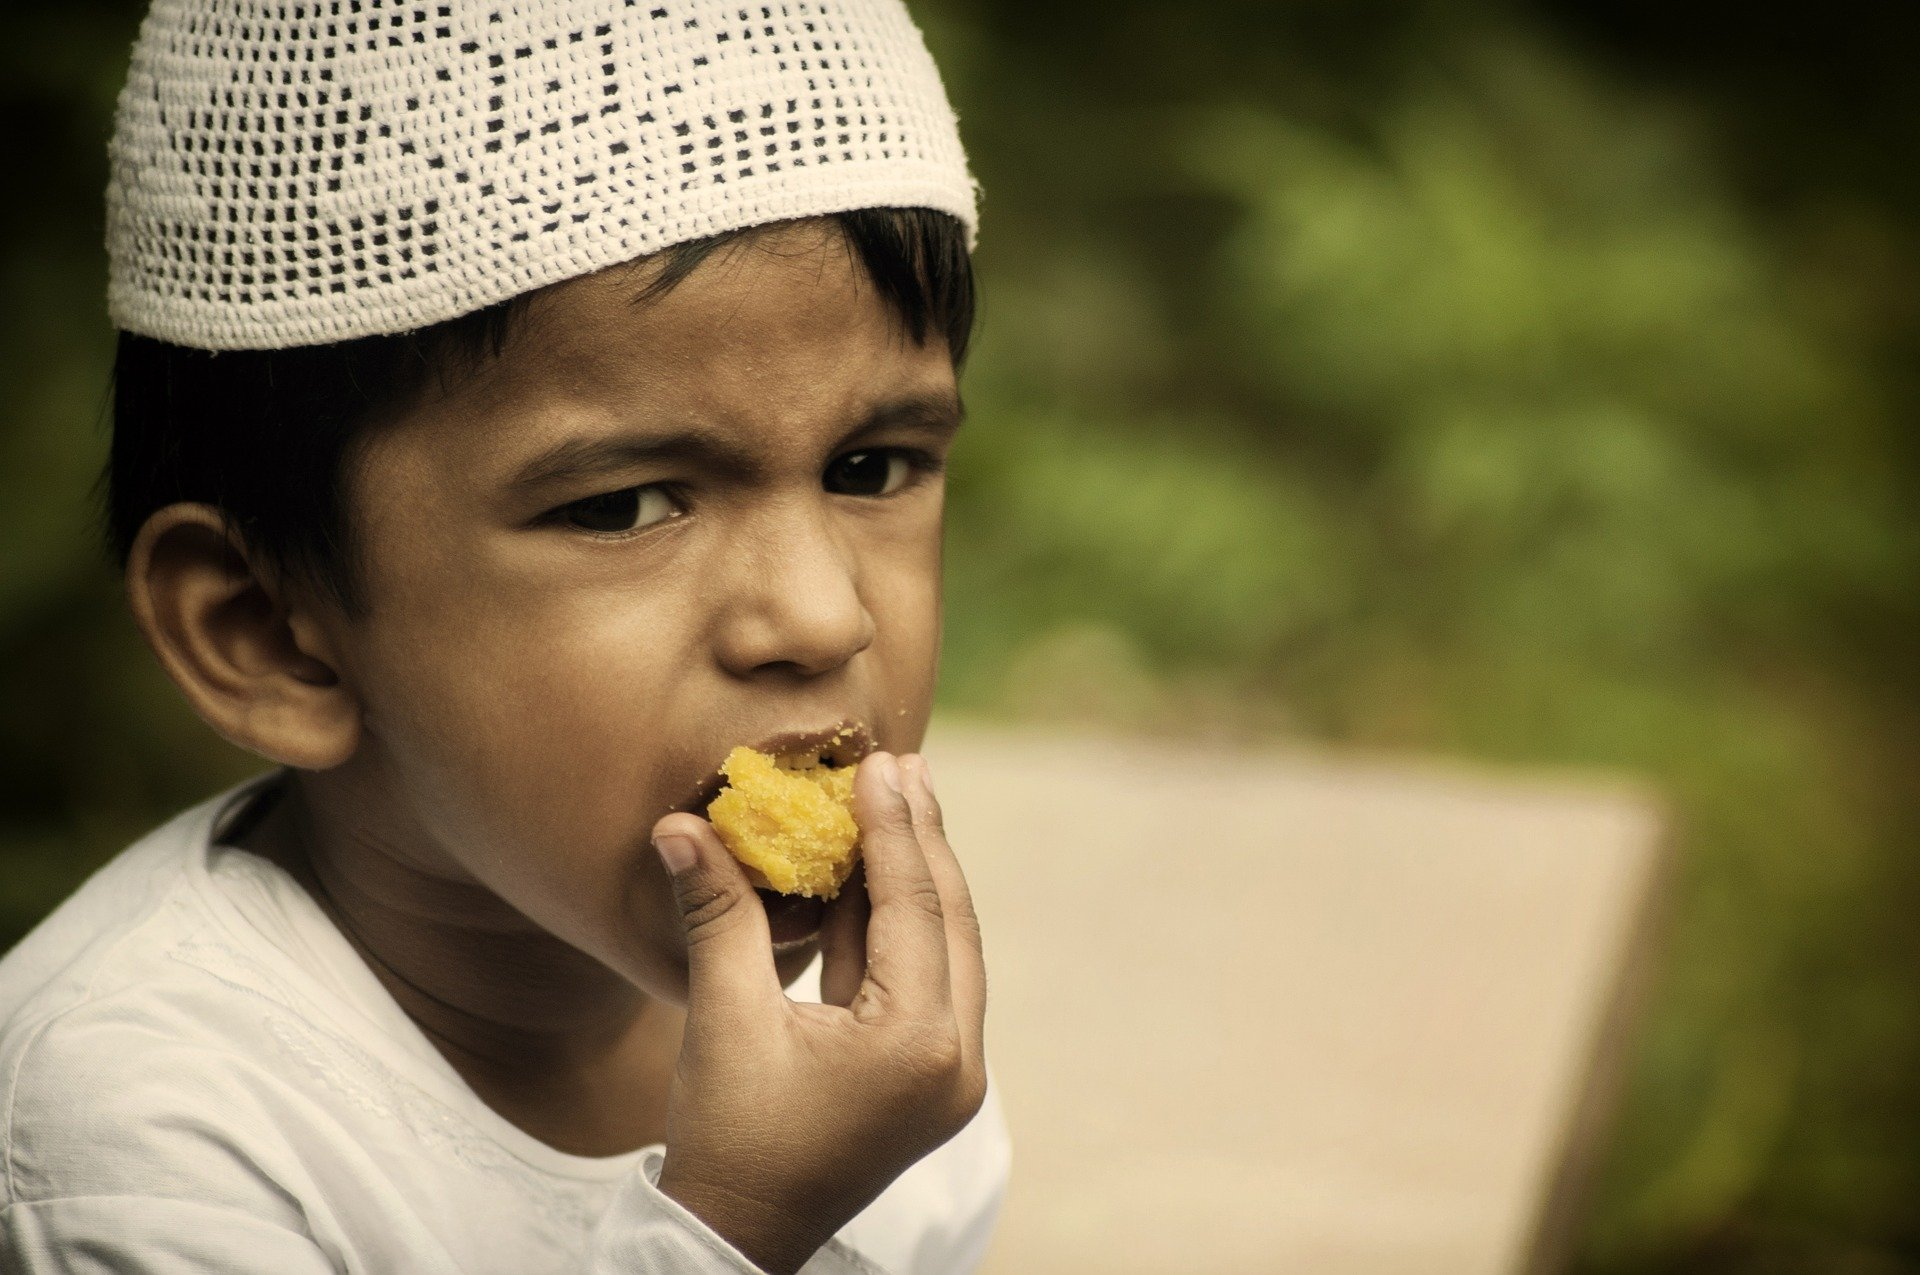 Garçon musulman qui mange durant le ramadan